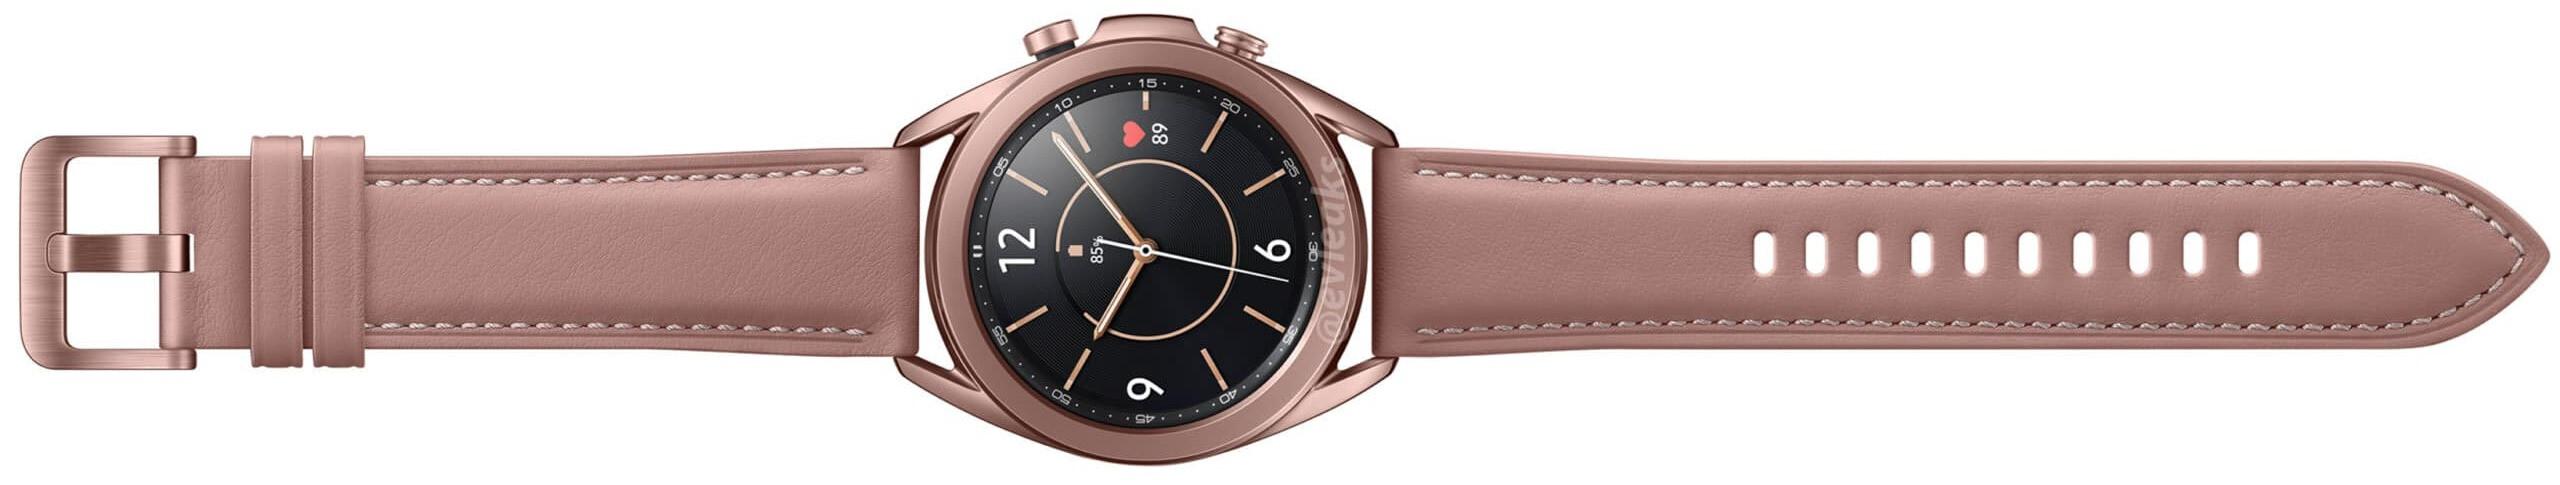 The 41mm Samsung Galaxy Watch 3 in bronze - Samsung Galaxy Watch 3 leaks in Titanium Black, tips the Unpacked 2020 date